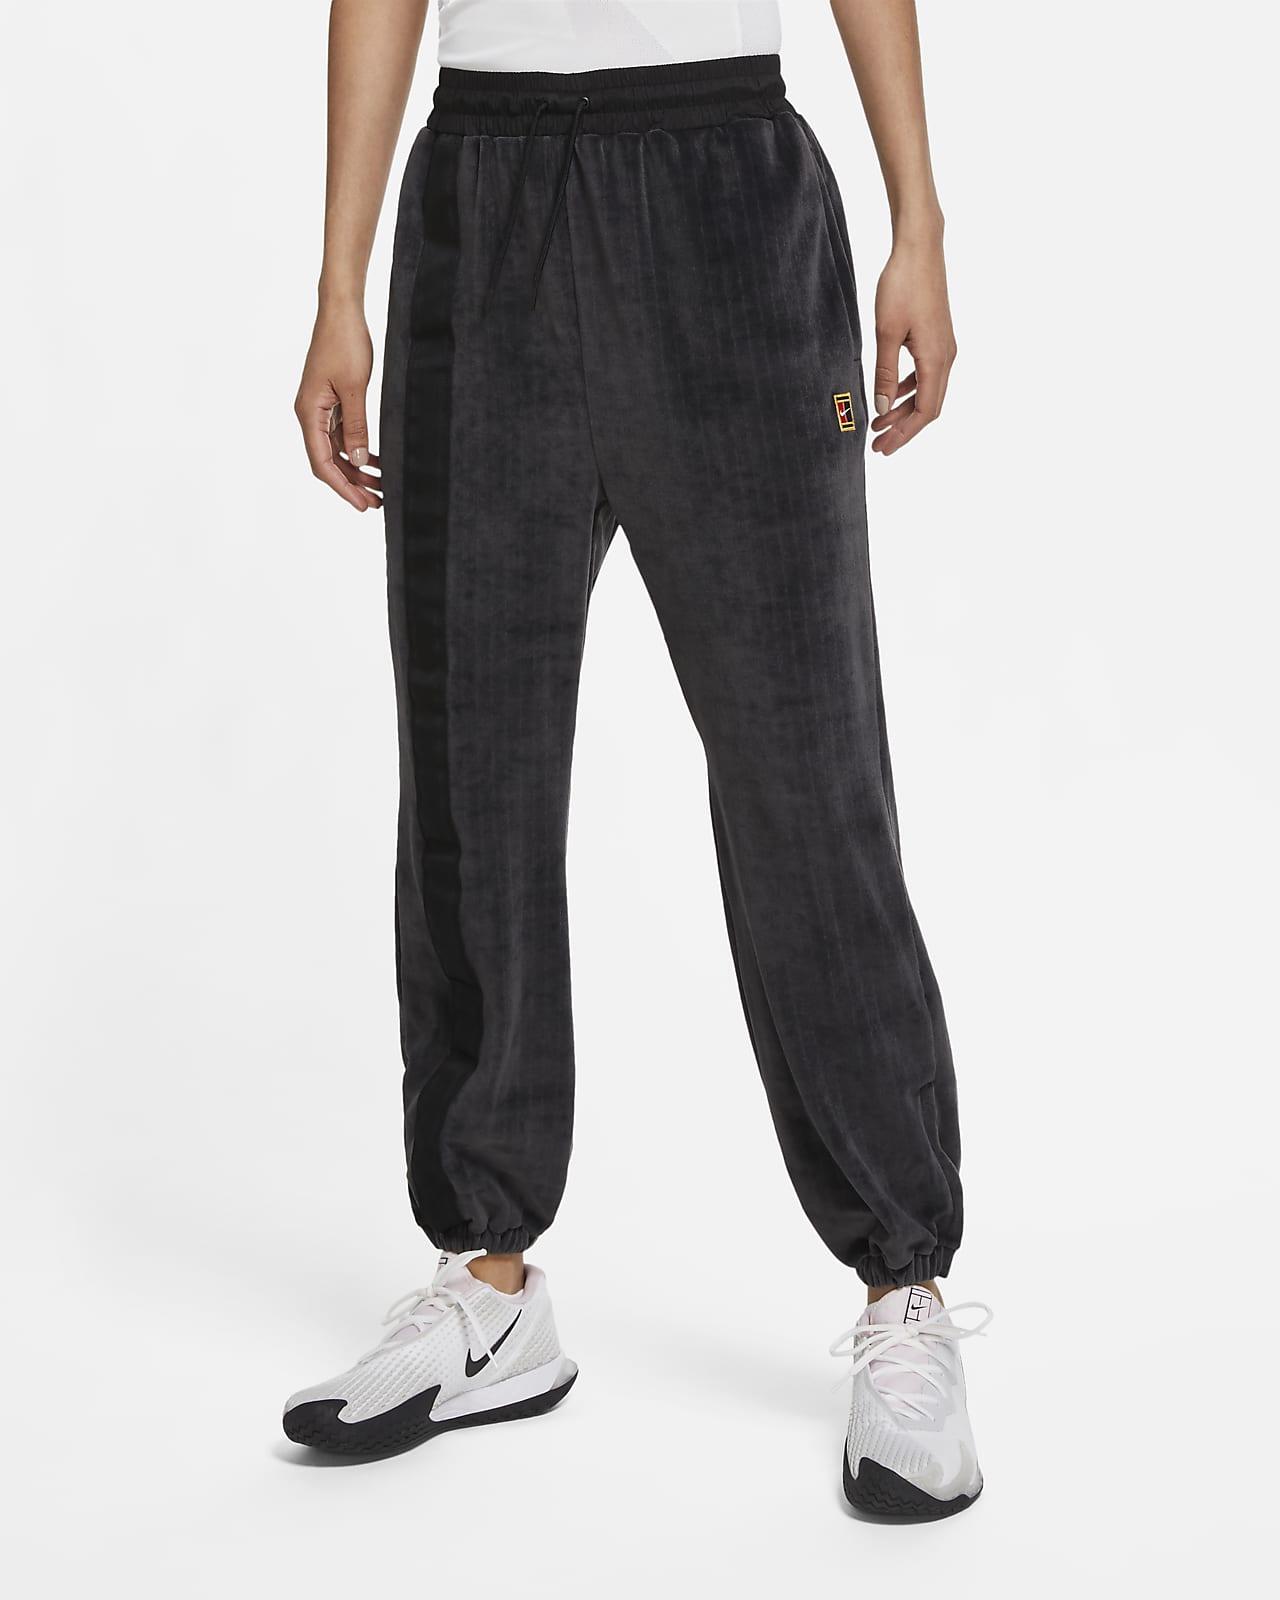 NikeCourt Women's Tennis Pants